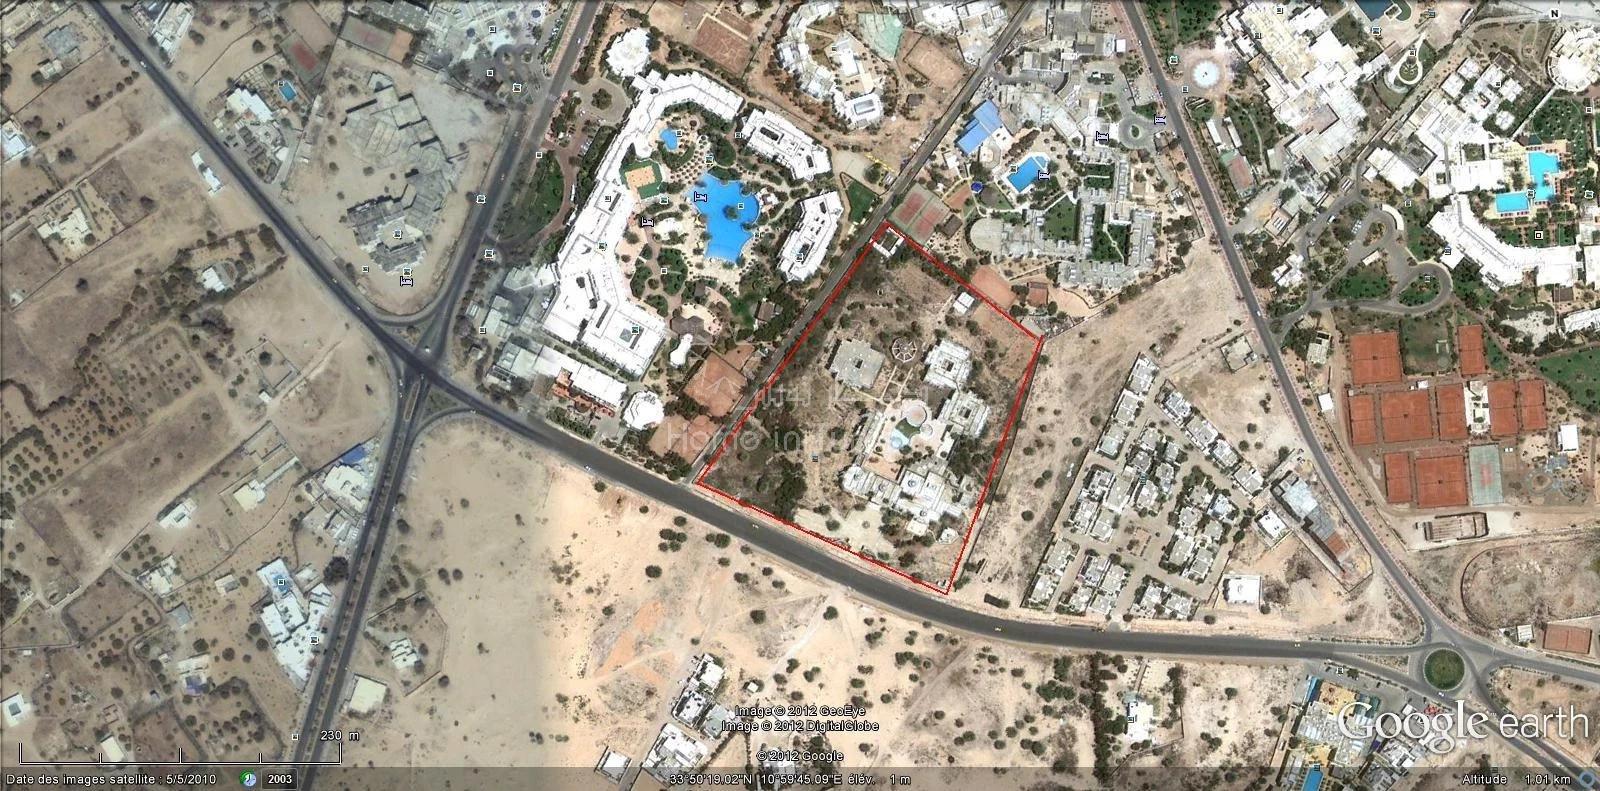 Hotel 4 étoiles avec 2 piscines à Djerba